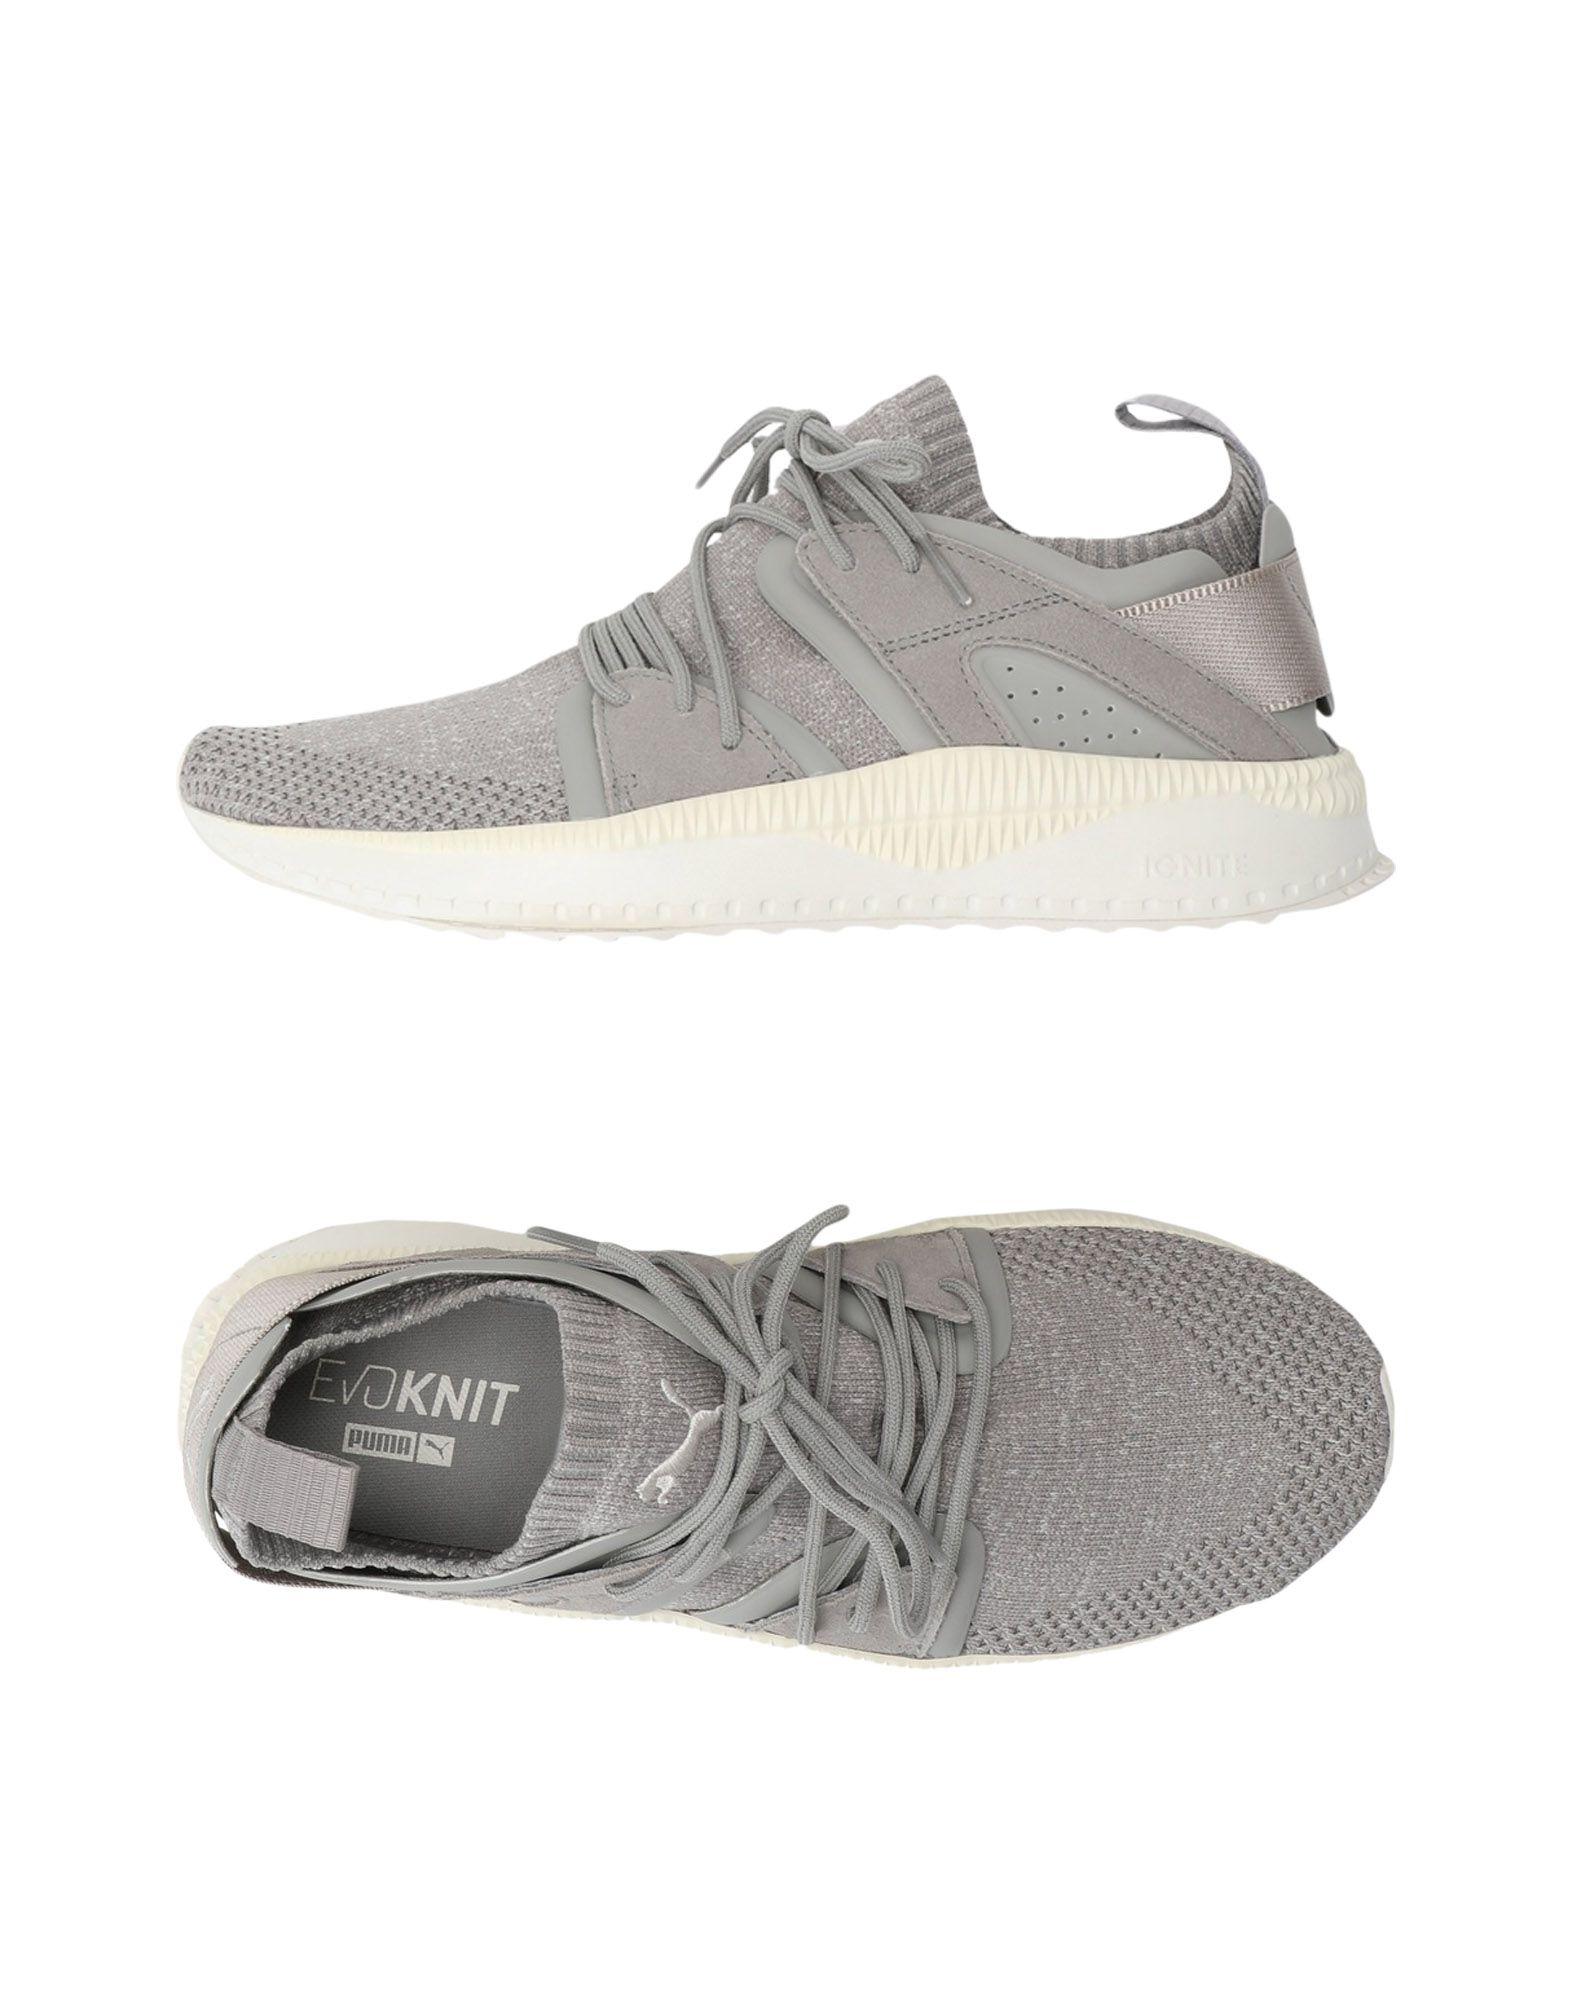 be570e6ac64 Puma Tsugi Blaze Evoknit - Sneakers - Men Puma Sneakers online on ...